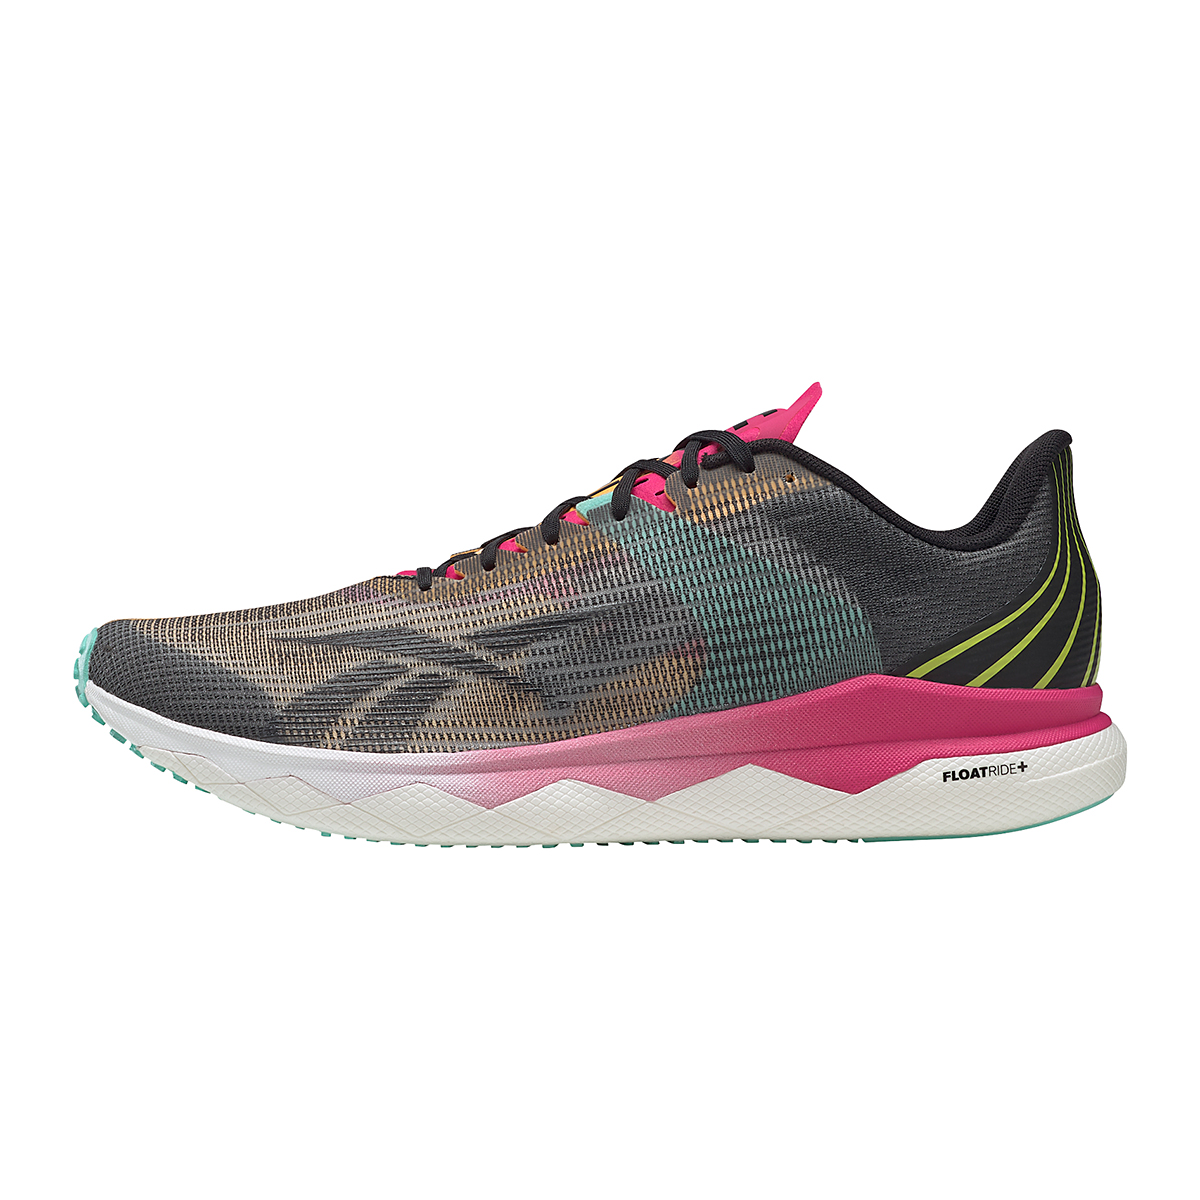 Men's Reebok Floatride Run Fast 3.0 Running Shoe - Color: Black/Purple Pink - Size: 7 - Width: Regular, Black/Purple Pink, large, image 2